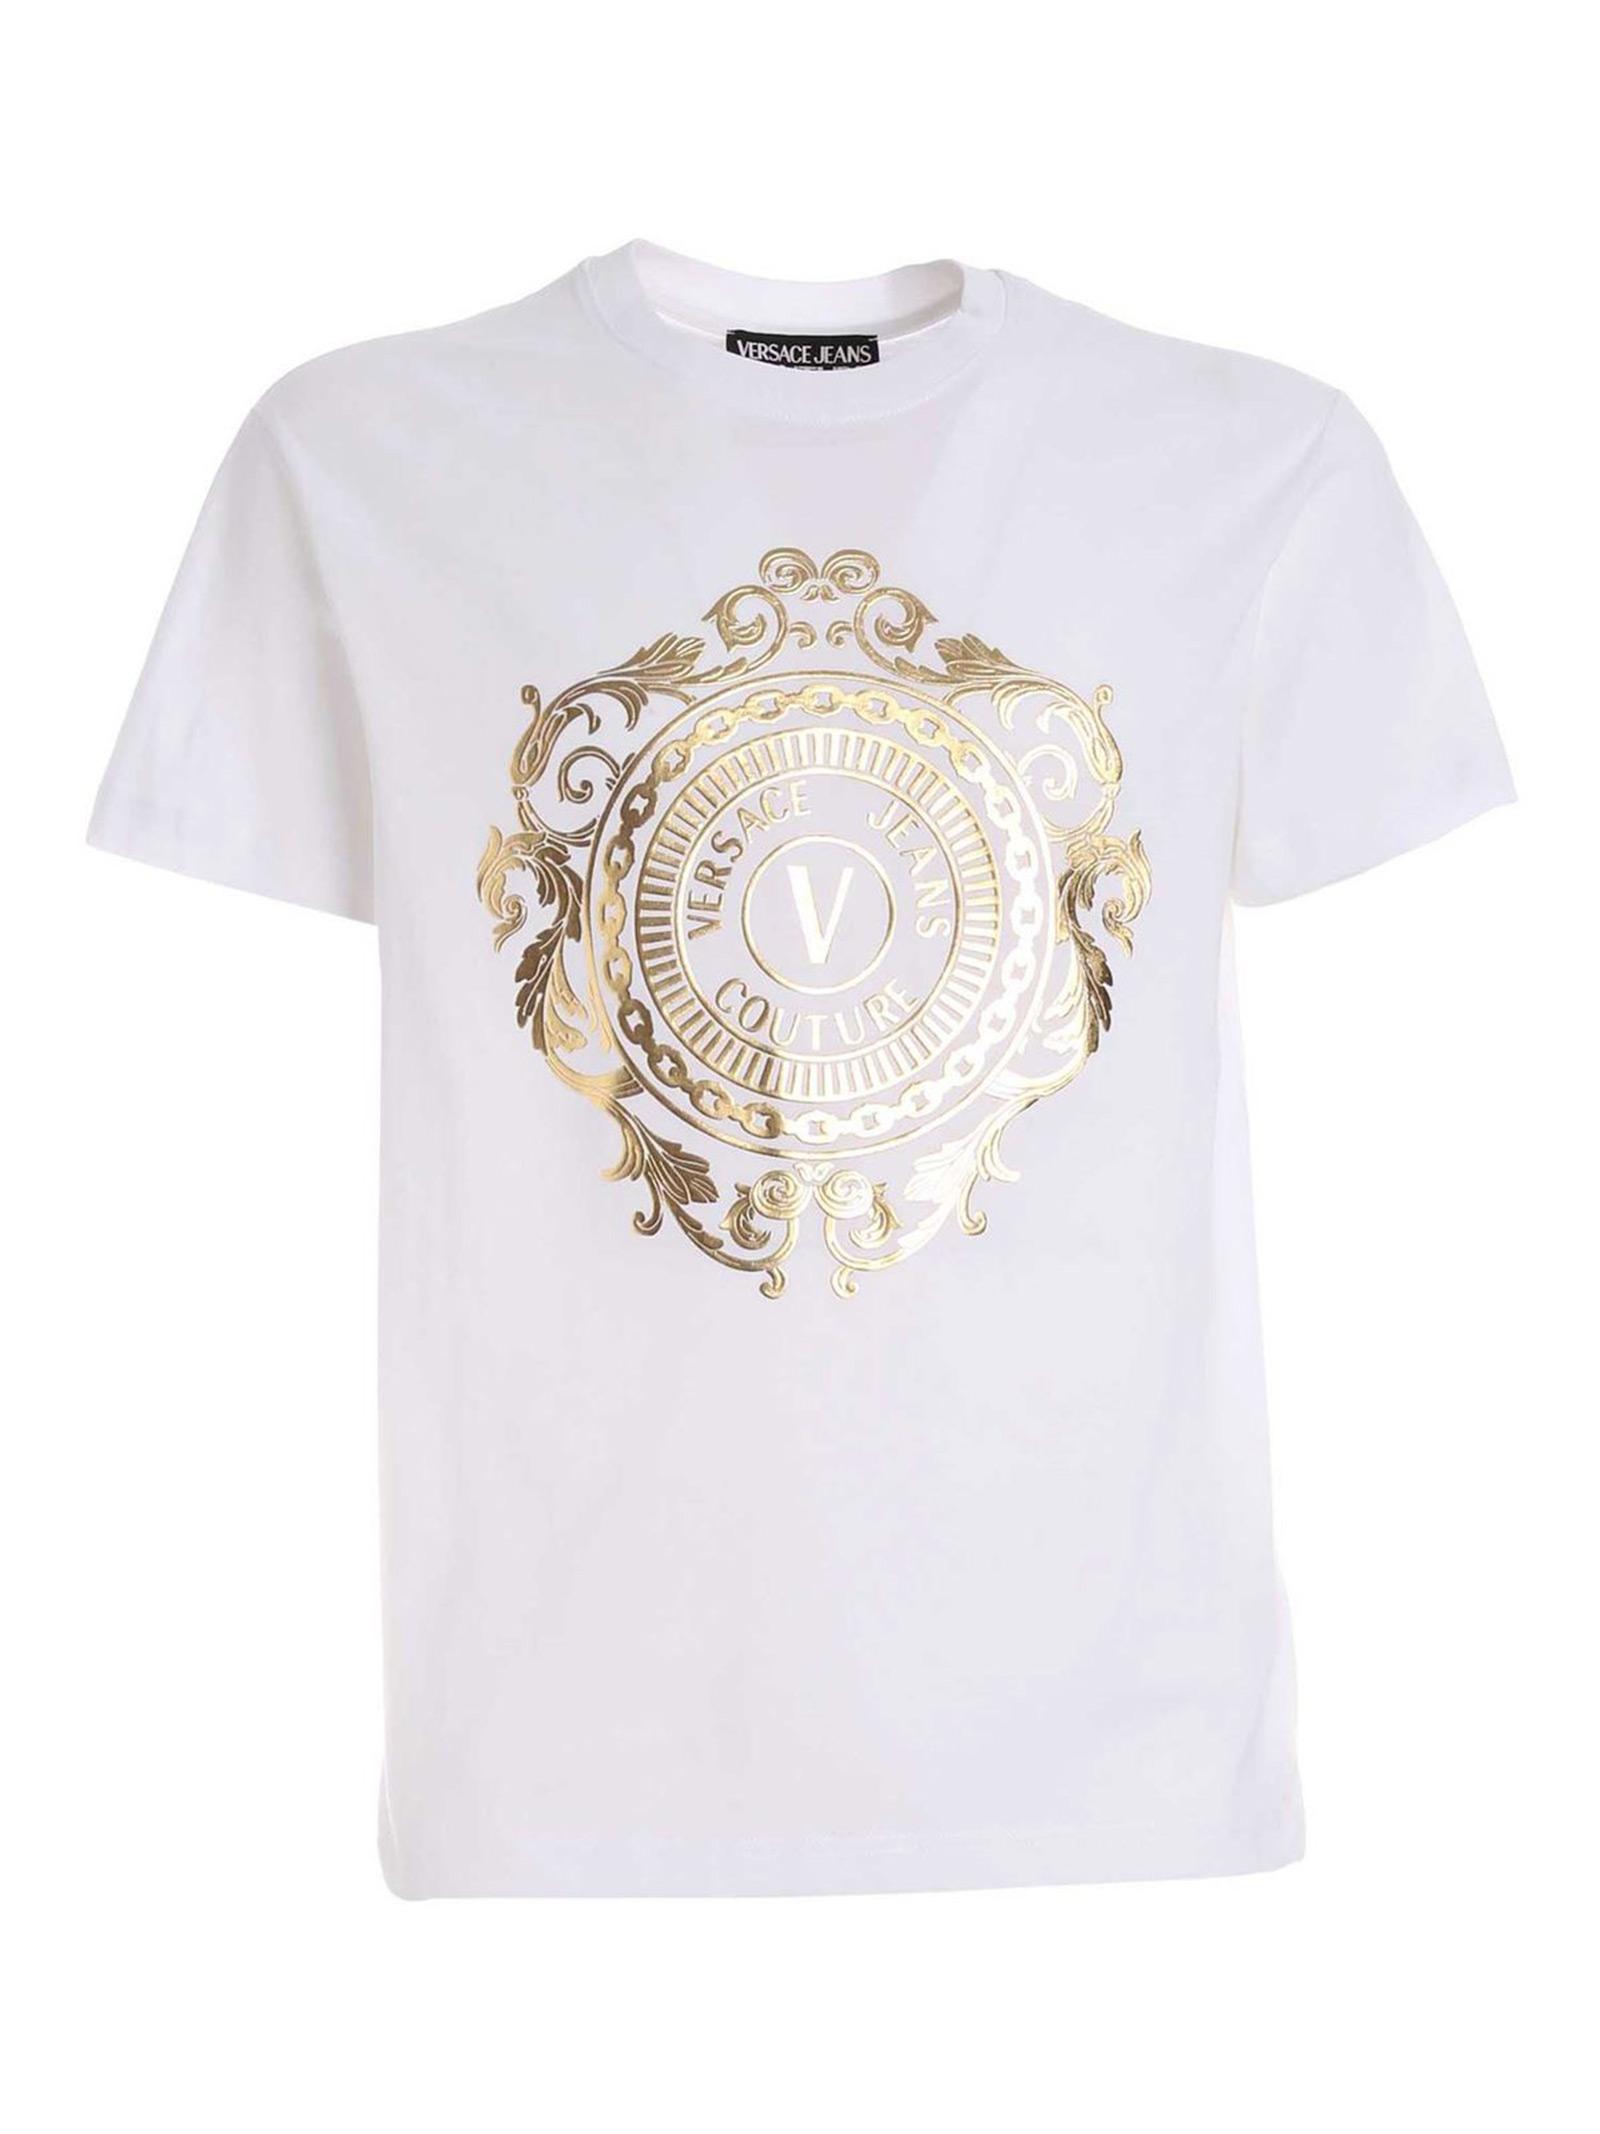 T-shirt Maniche Corte VERSACE JEANS   T-shirt   B3 GWA74F30454 K41